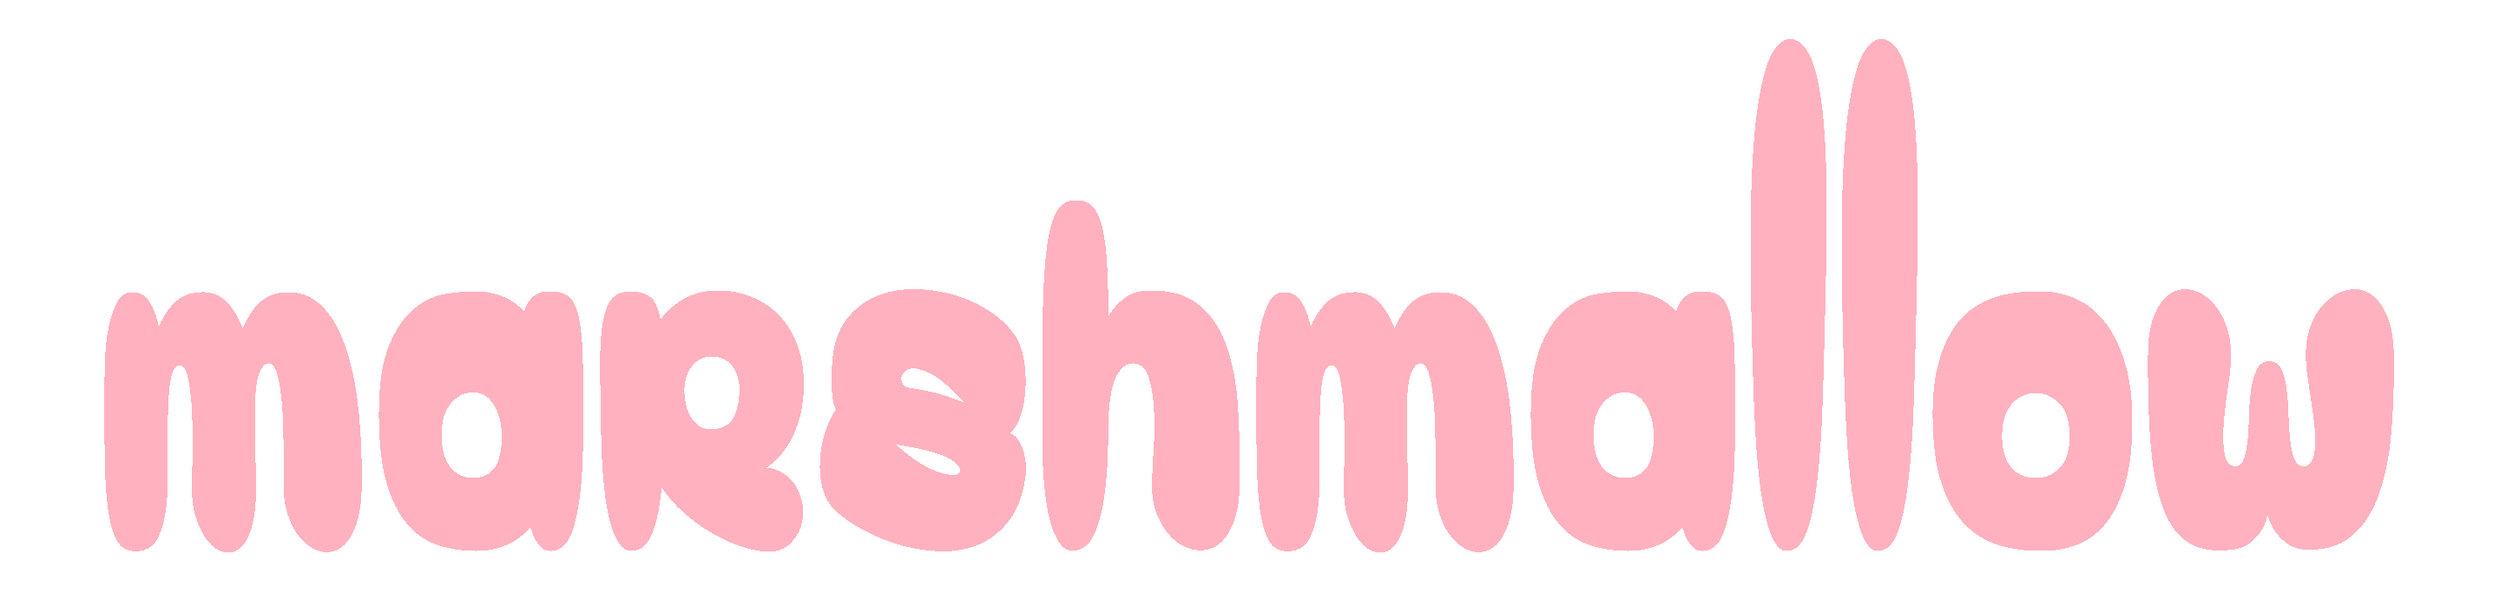 marshmallow logo_2.jpg